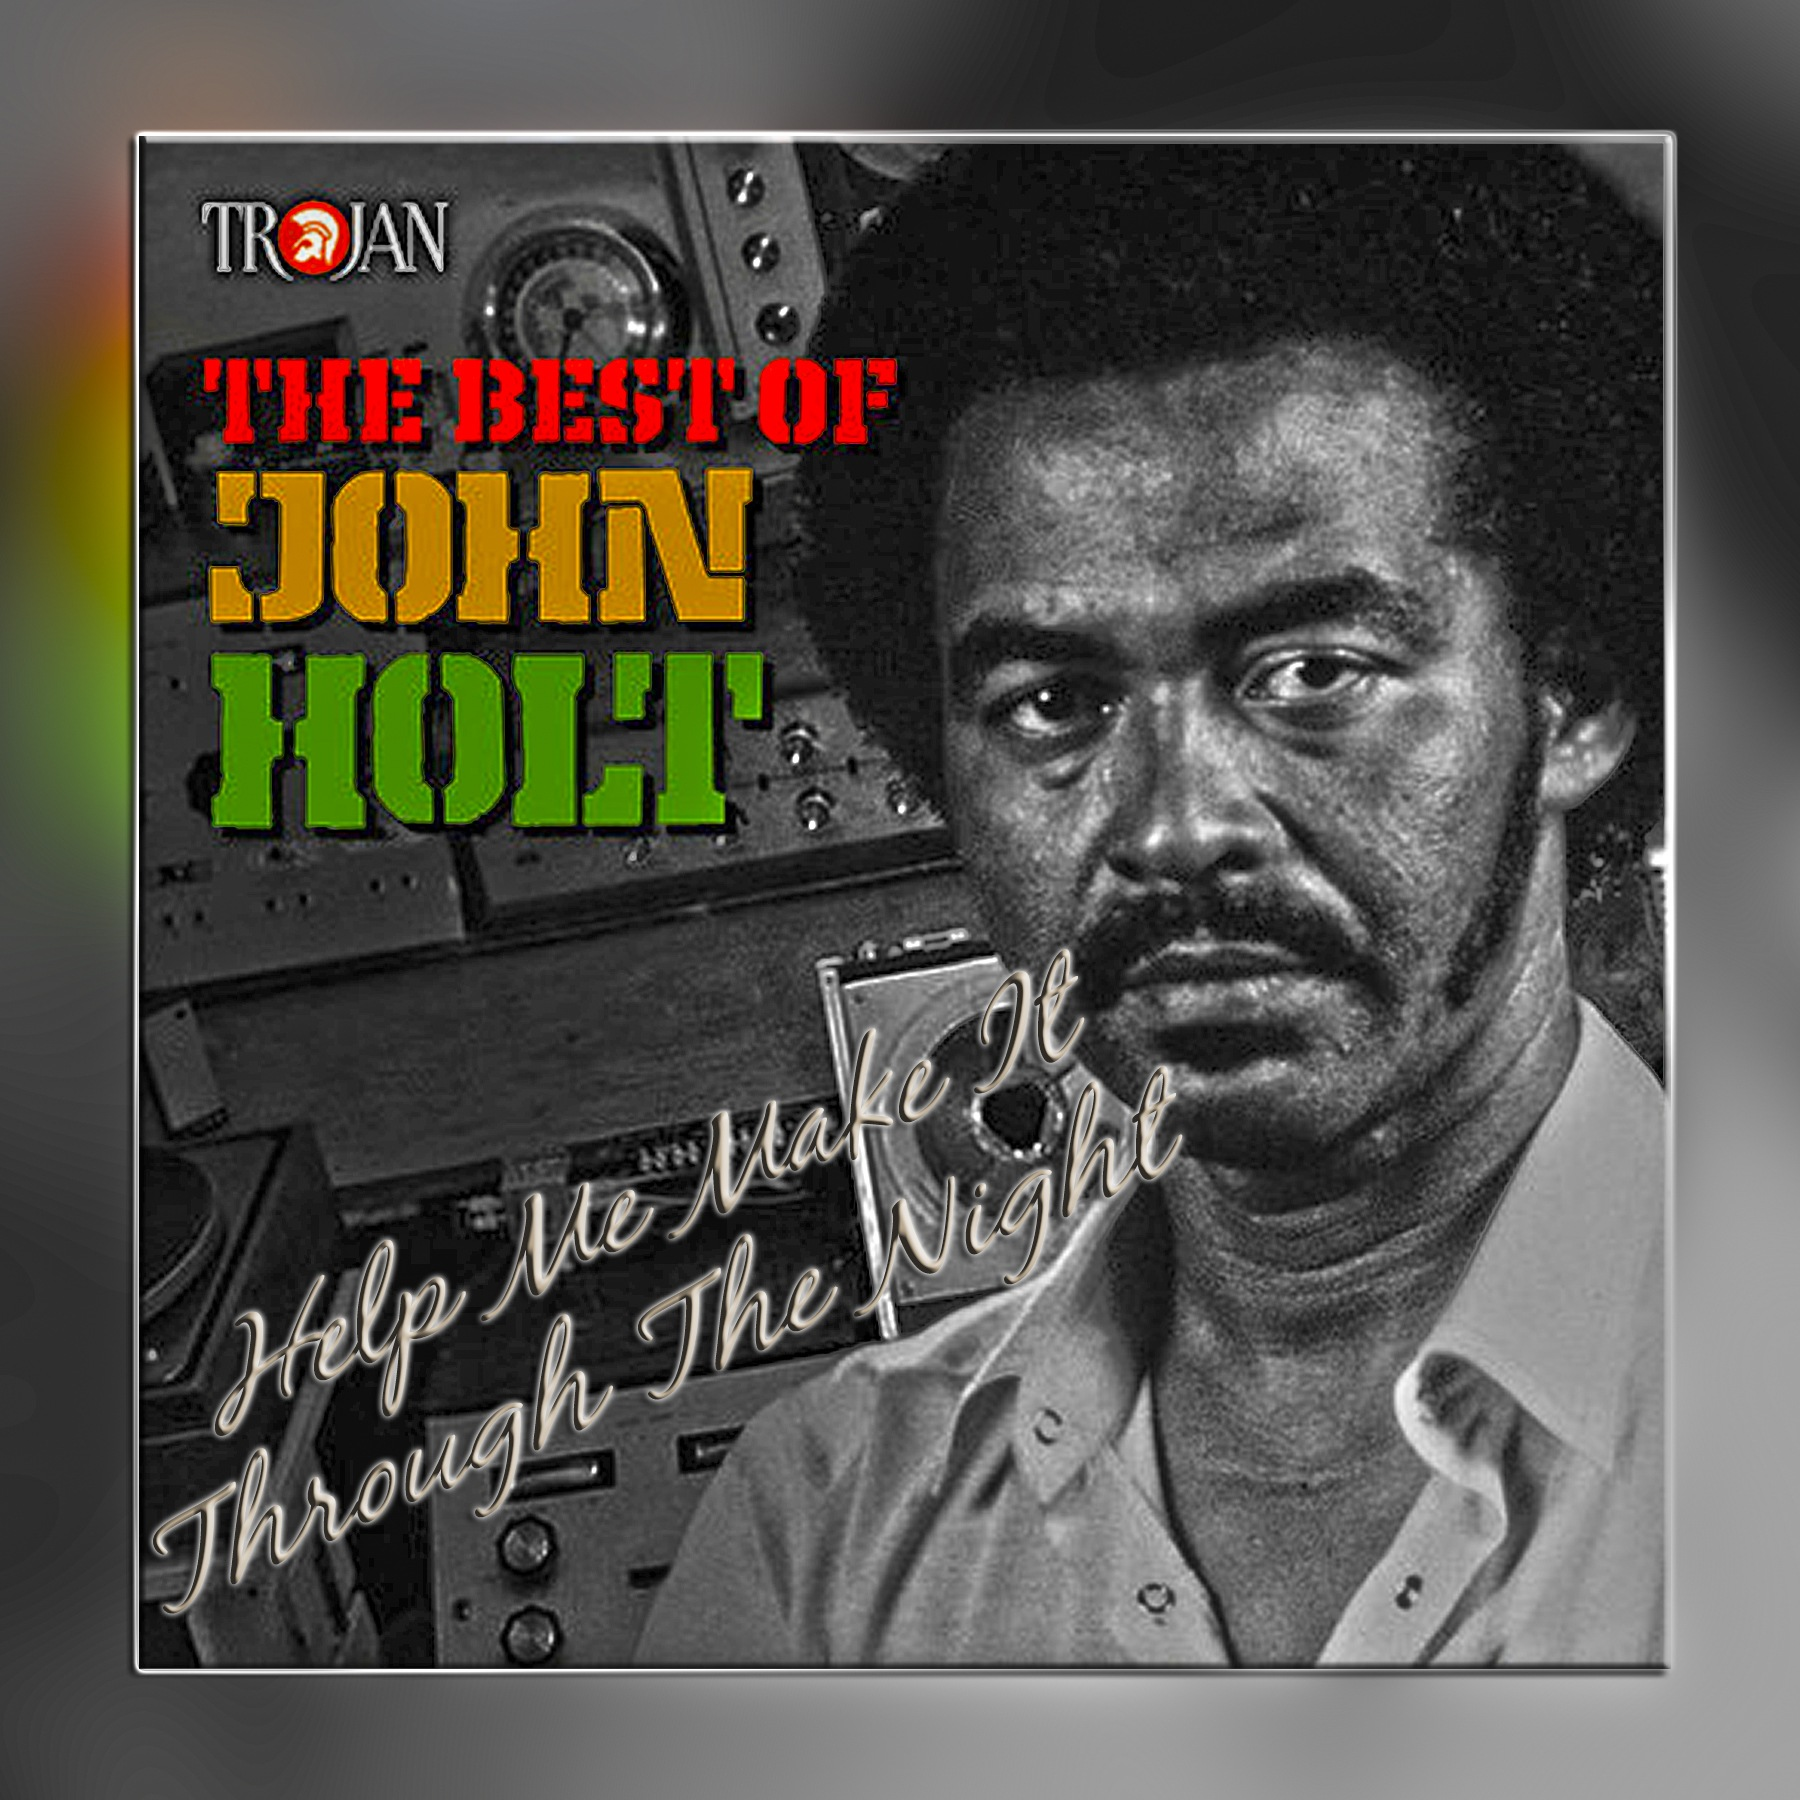 LP Covers: John Holt by Mikael Rennerhorn